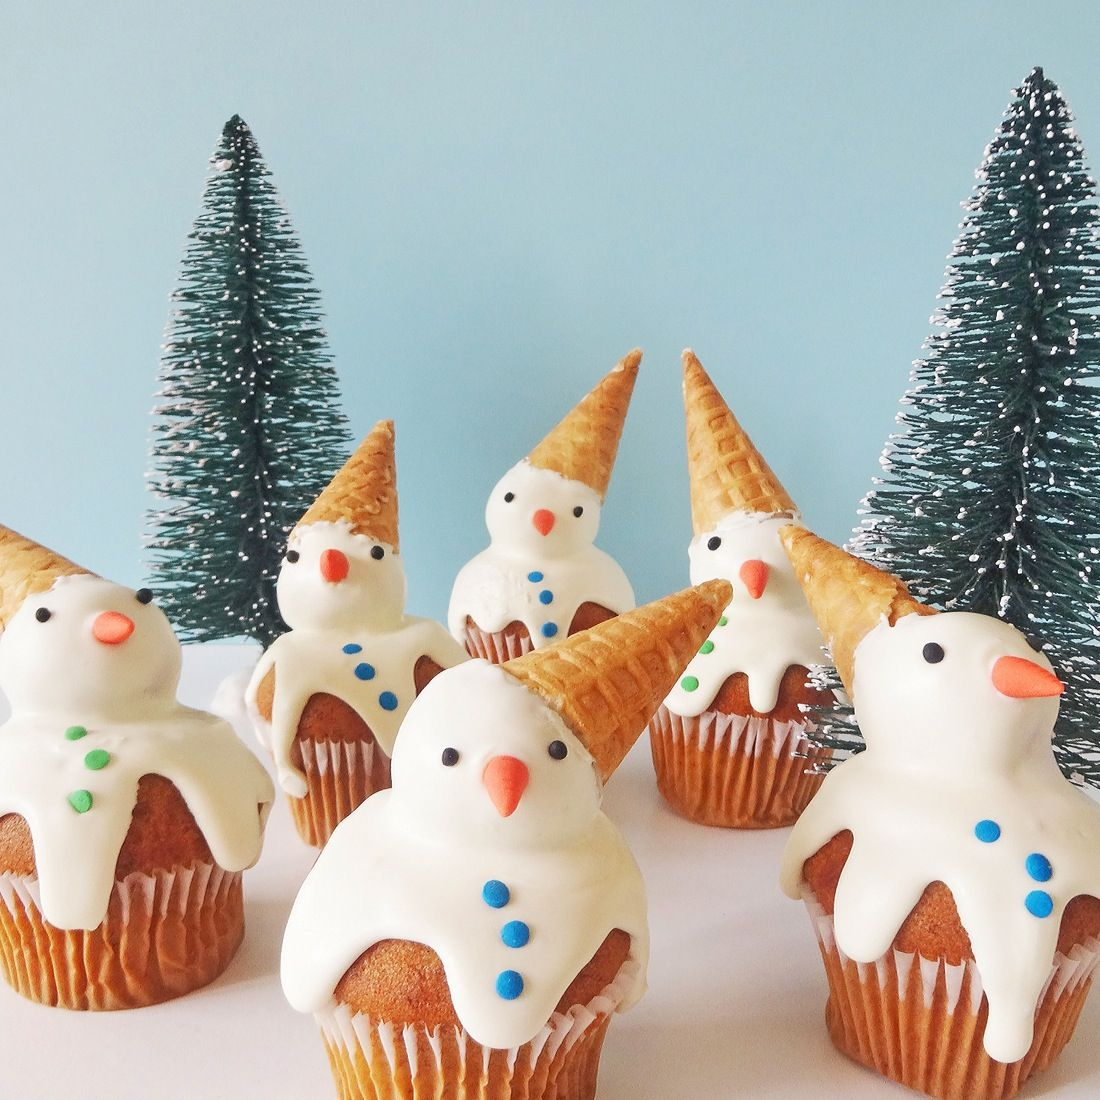 These Adorable Snowmen Cupcakes Will Make You Melt | Recipe | Snowman cupcakes, Christmas ...